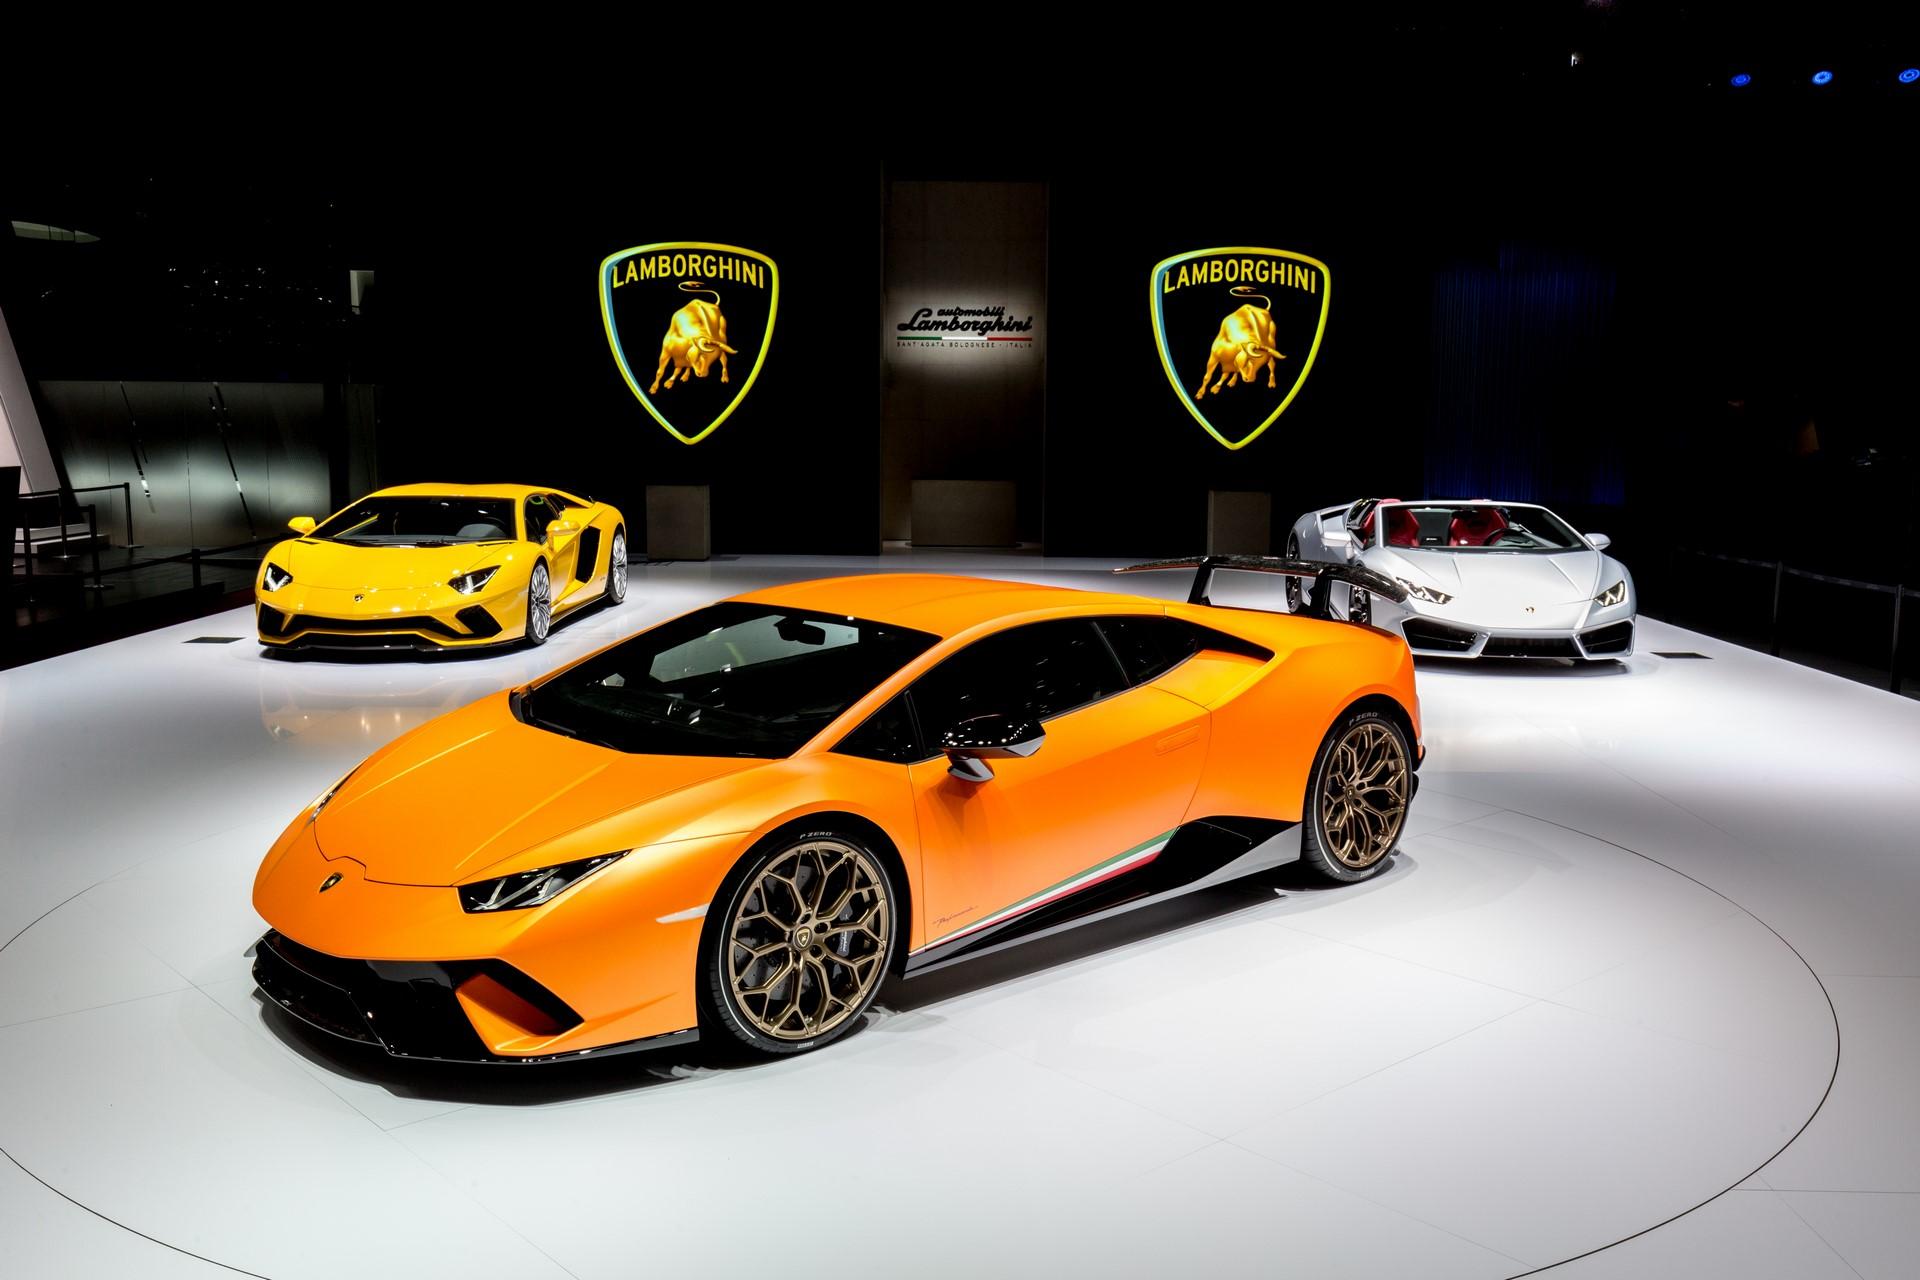 Lamborghini Huracan Performante Geneva 2017 (9)